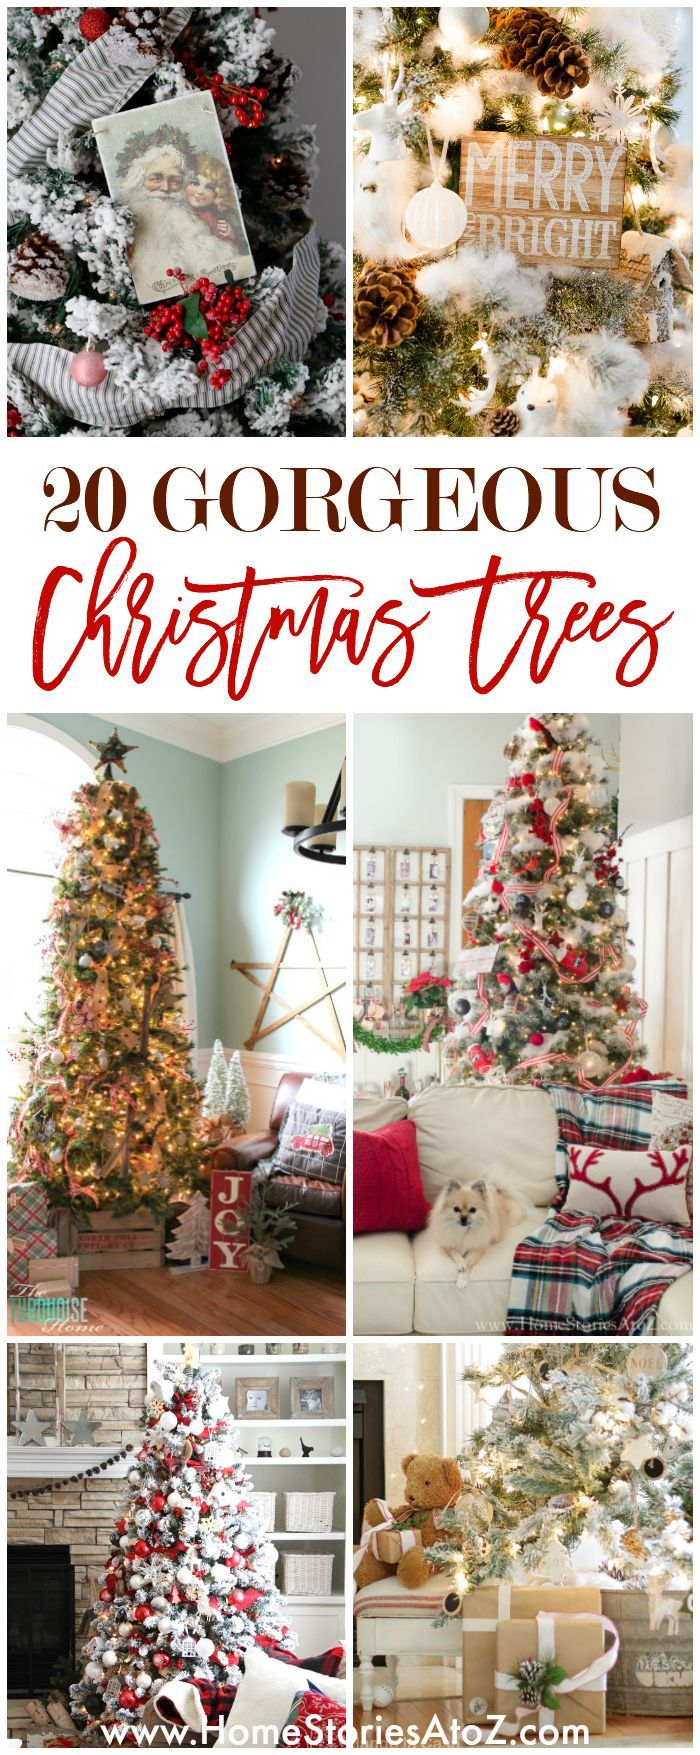 e704b1841998 20 Beautiful Christmas Tree Ideas - Home Stories A…